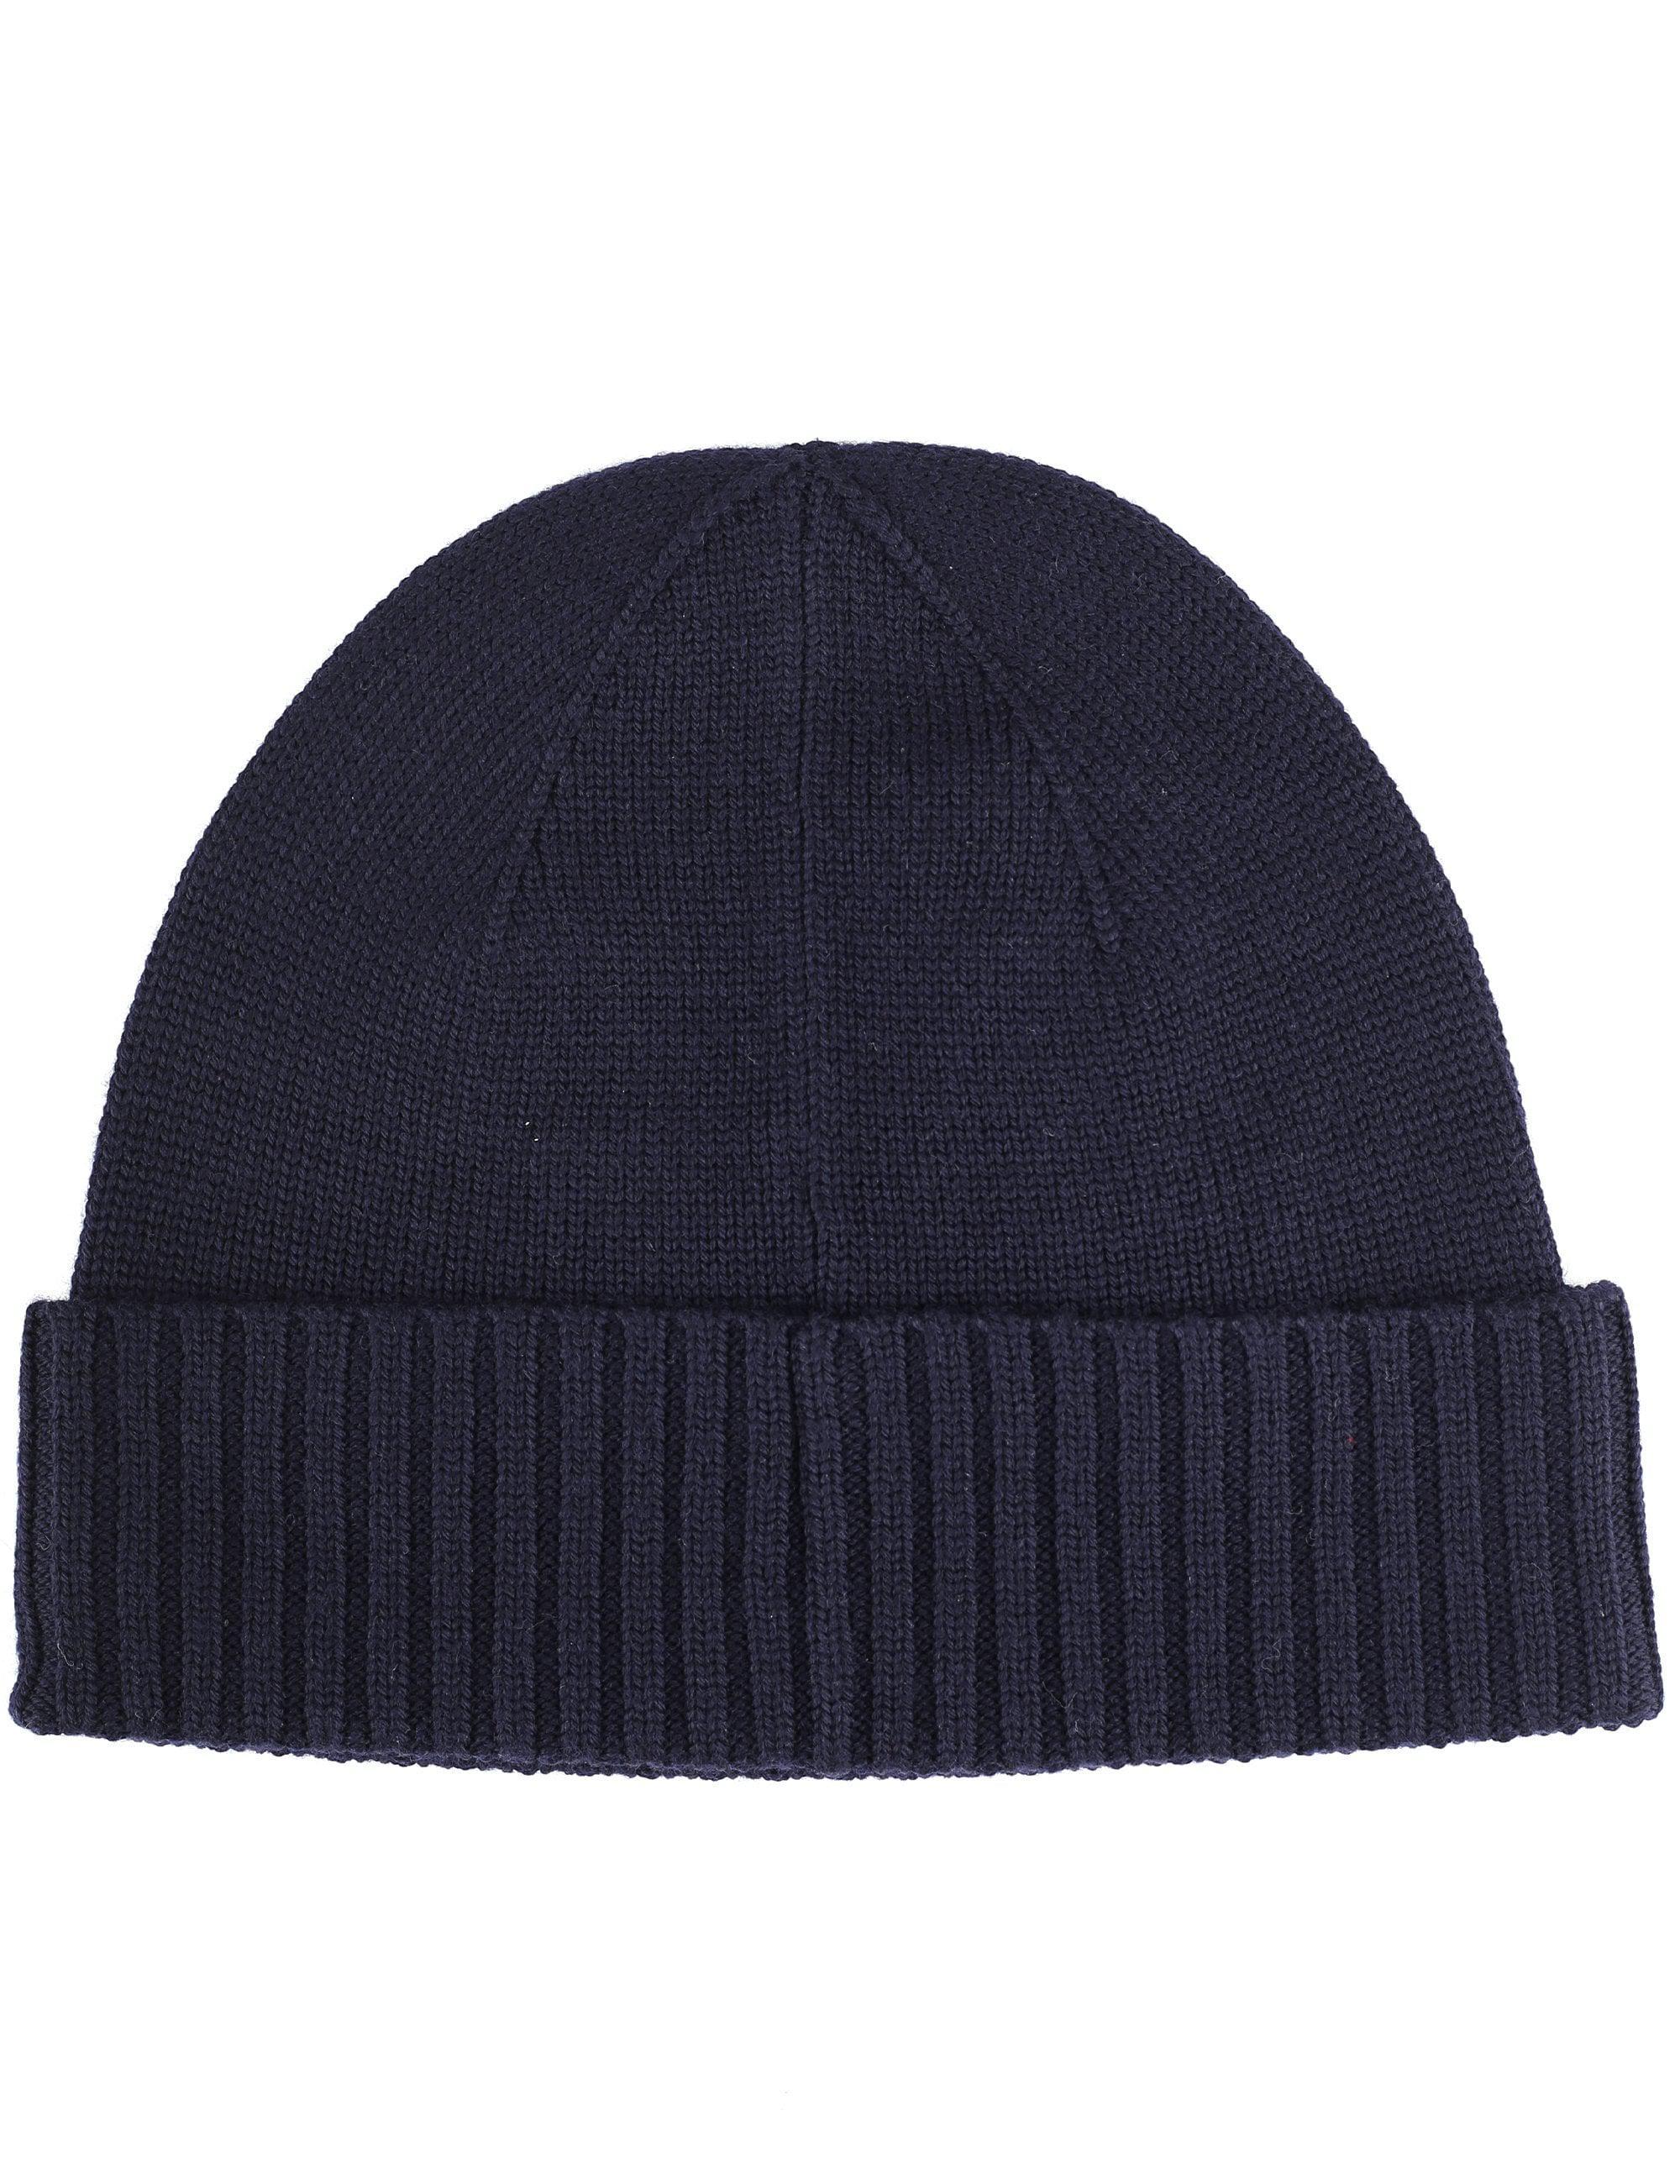 4d30d520e2b Polo Ralph Lauren Men s Fo Beanie Hat Blue in Blue for Men - Save 2.5% -  Lyst